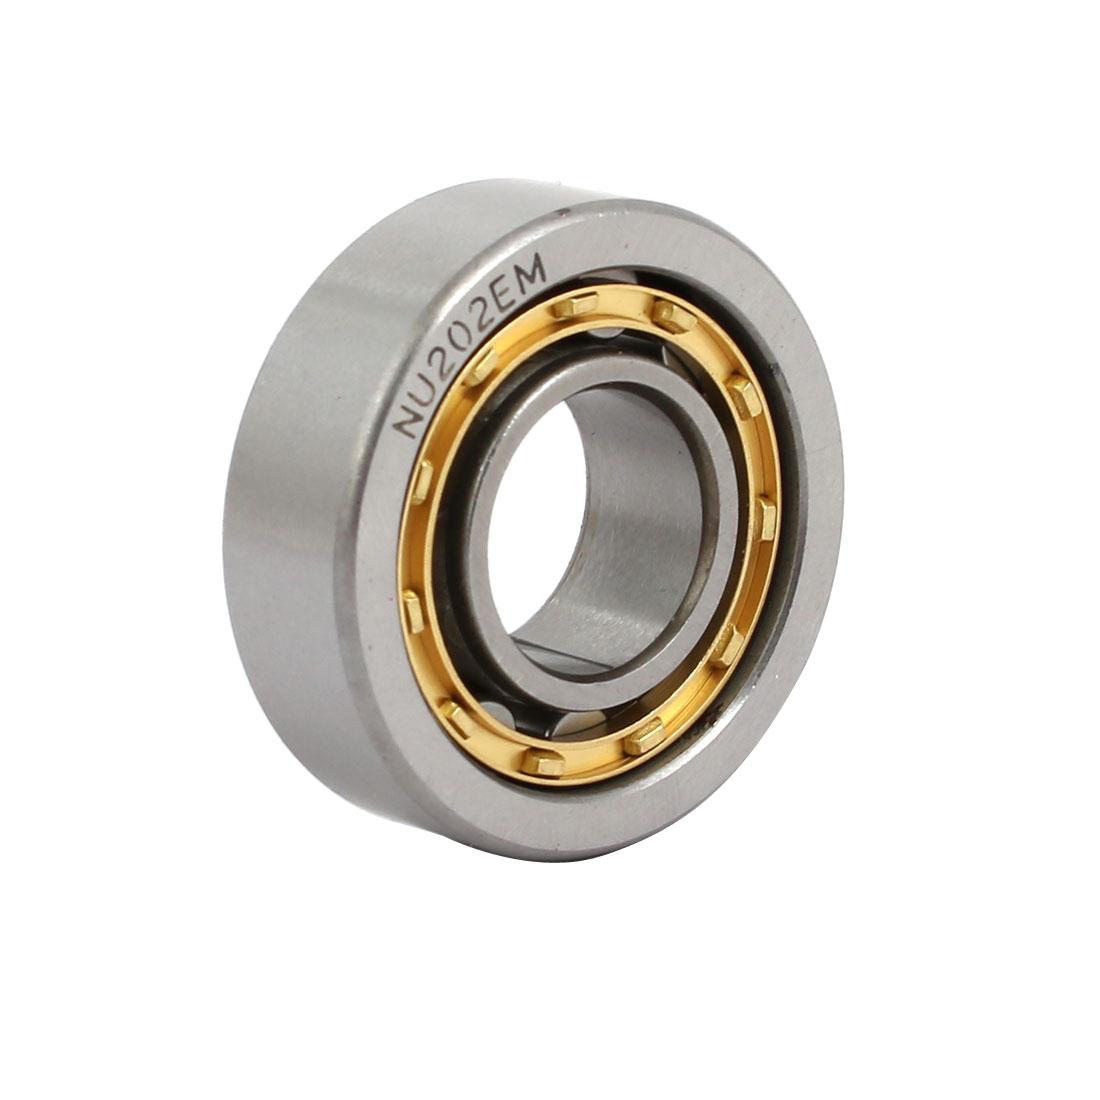 NU202EM 35mmx15mmx10mm Single Row Cylindrical Roller Bearing